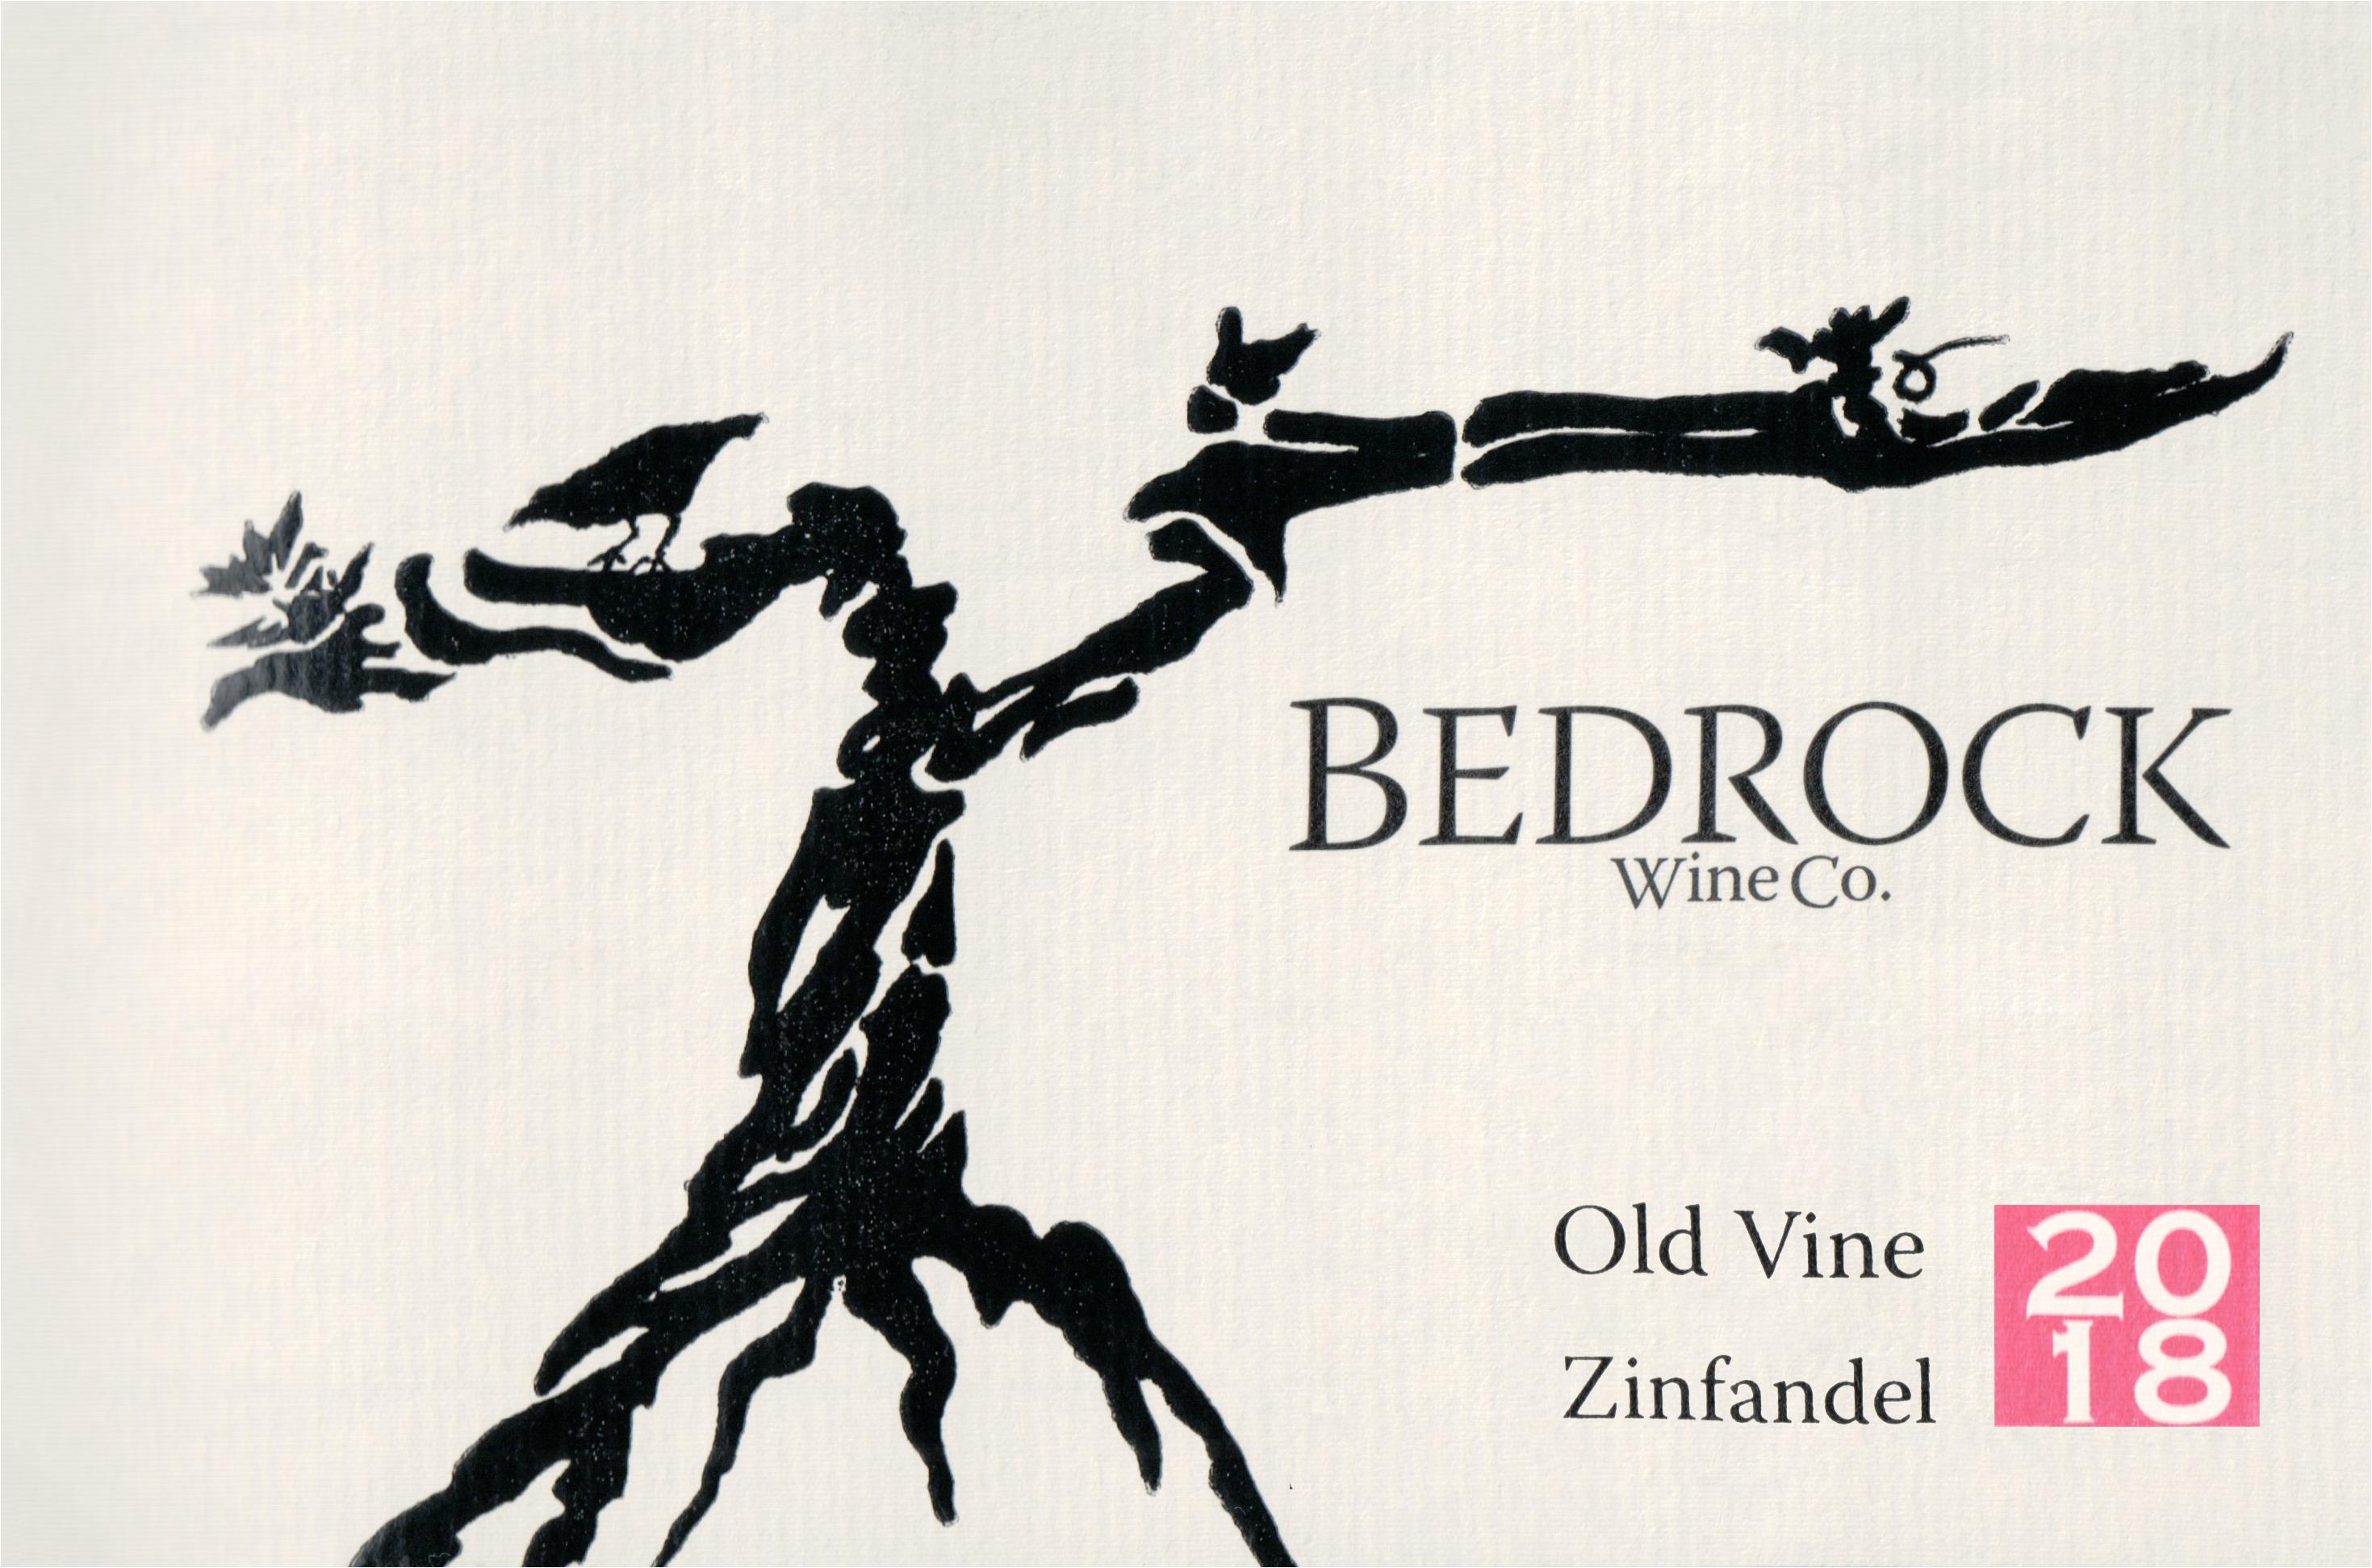 Bedrock Zinfandel Old Vines 2018